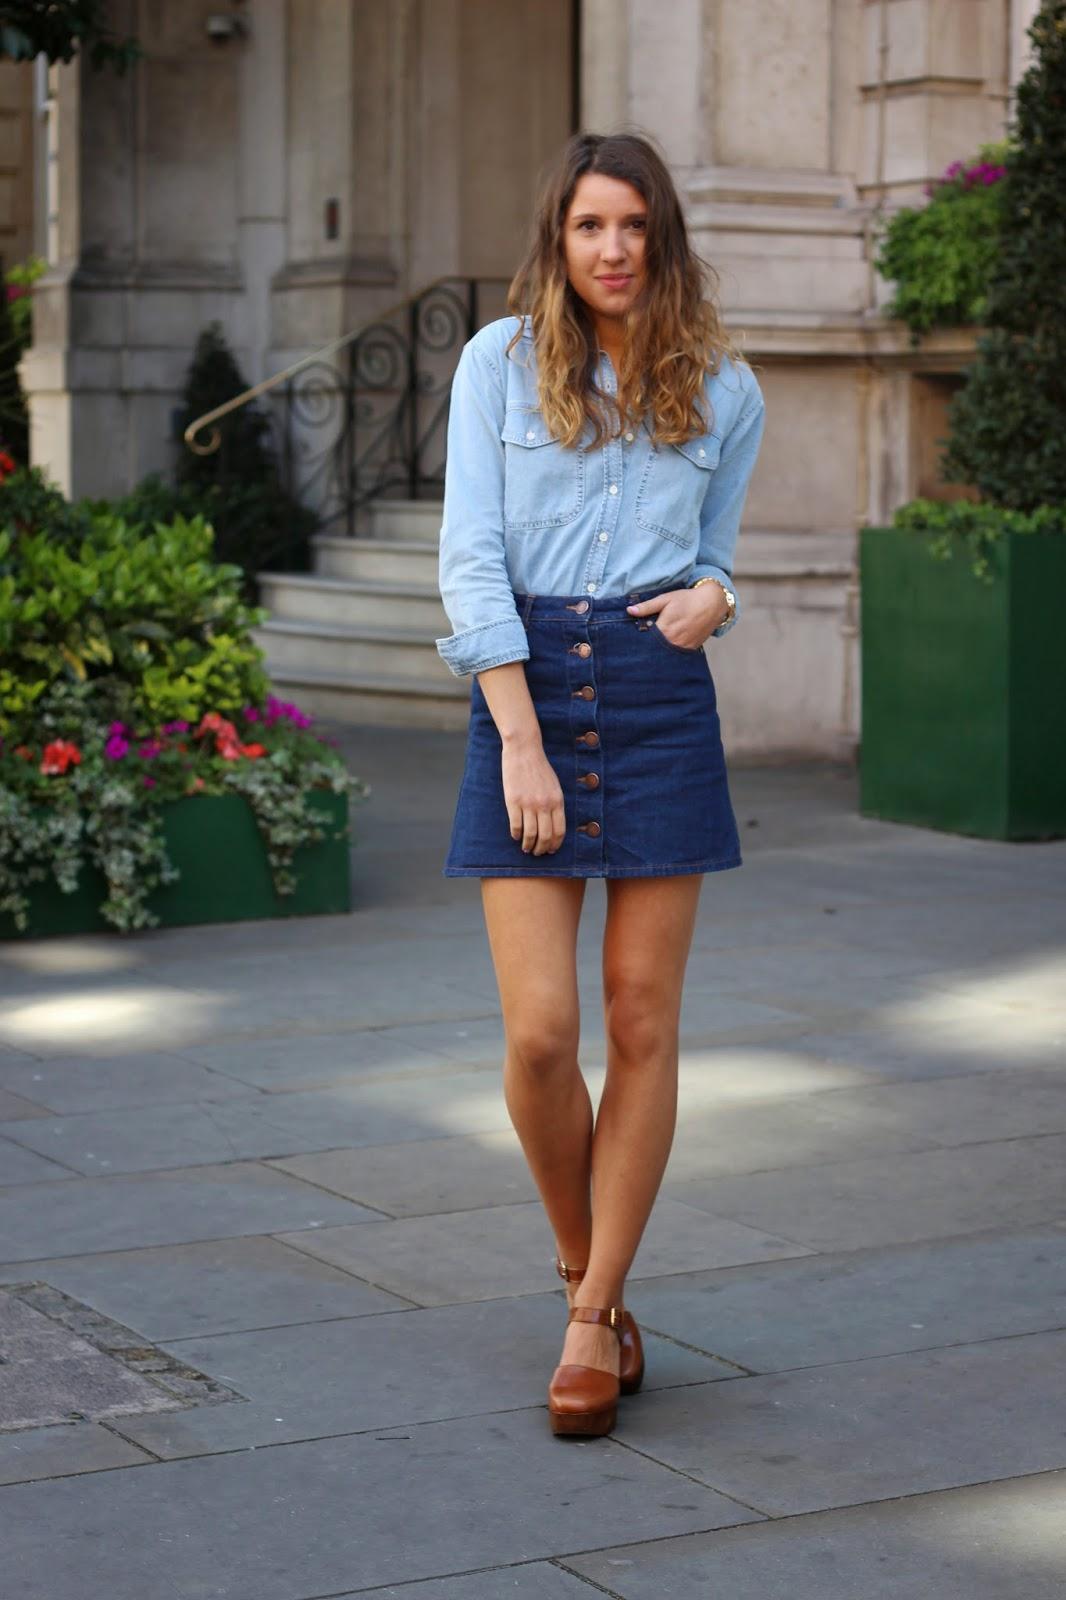 Double Denim | What's In Her Wardrobe